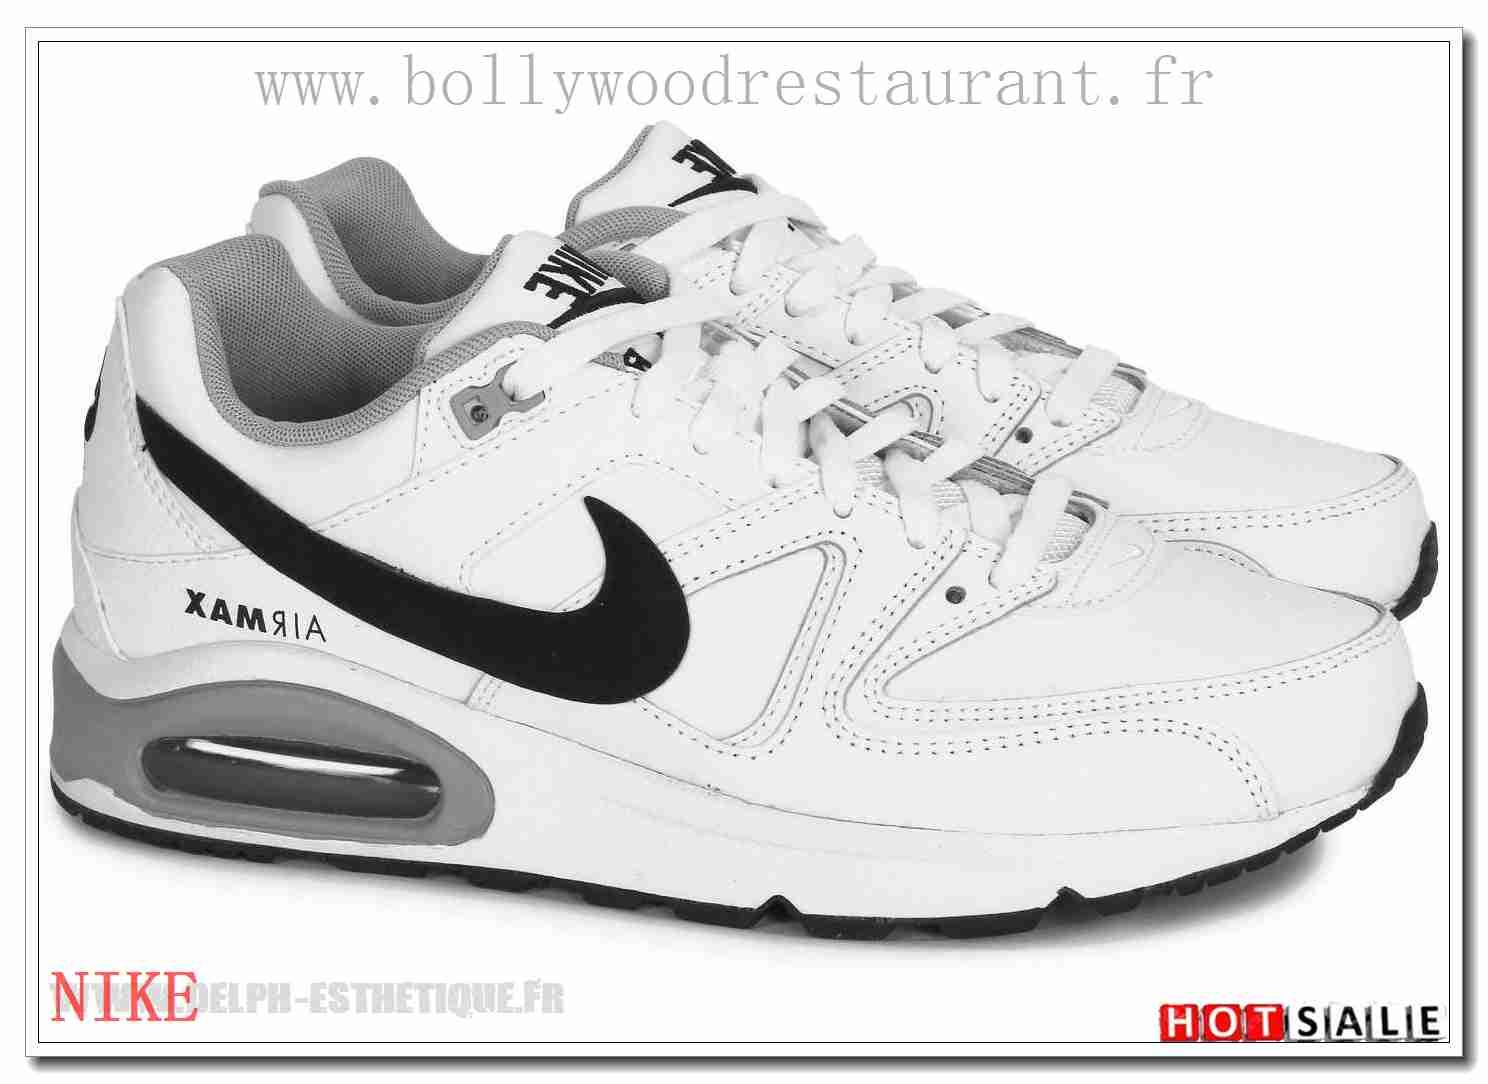 newest 511a0 5409e HC0992 Achat Pas Cher Mondiaux 2018 Nouveau style Nike Air Max Command -  Homme Chaussures - Promotions Vente - H.K.Y. 887 - Taille   40~44